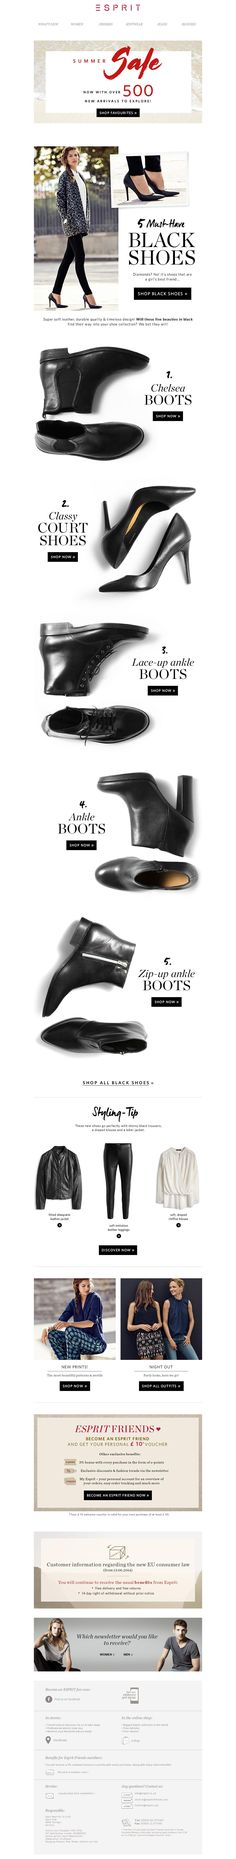 ESPRIT sale #emailmkt #fashion #shoes